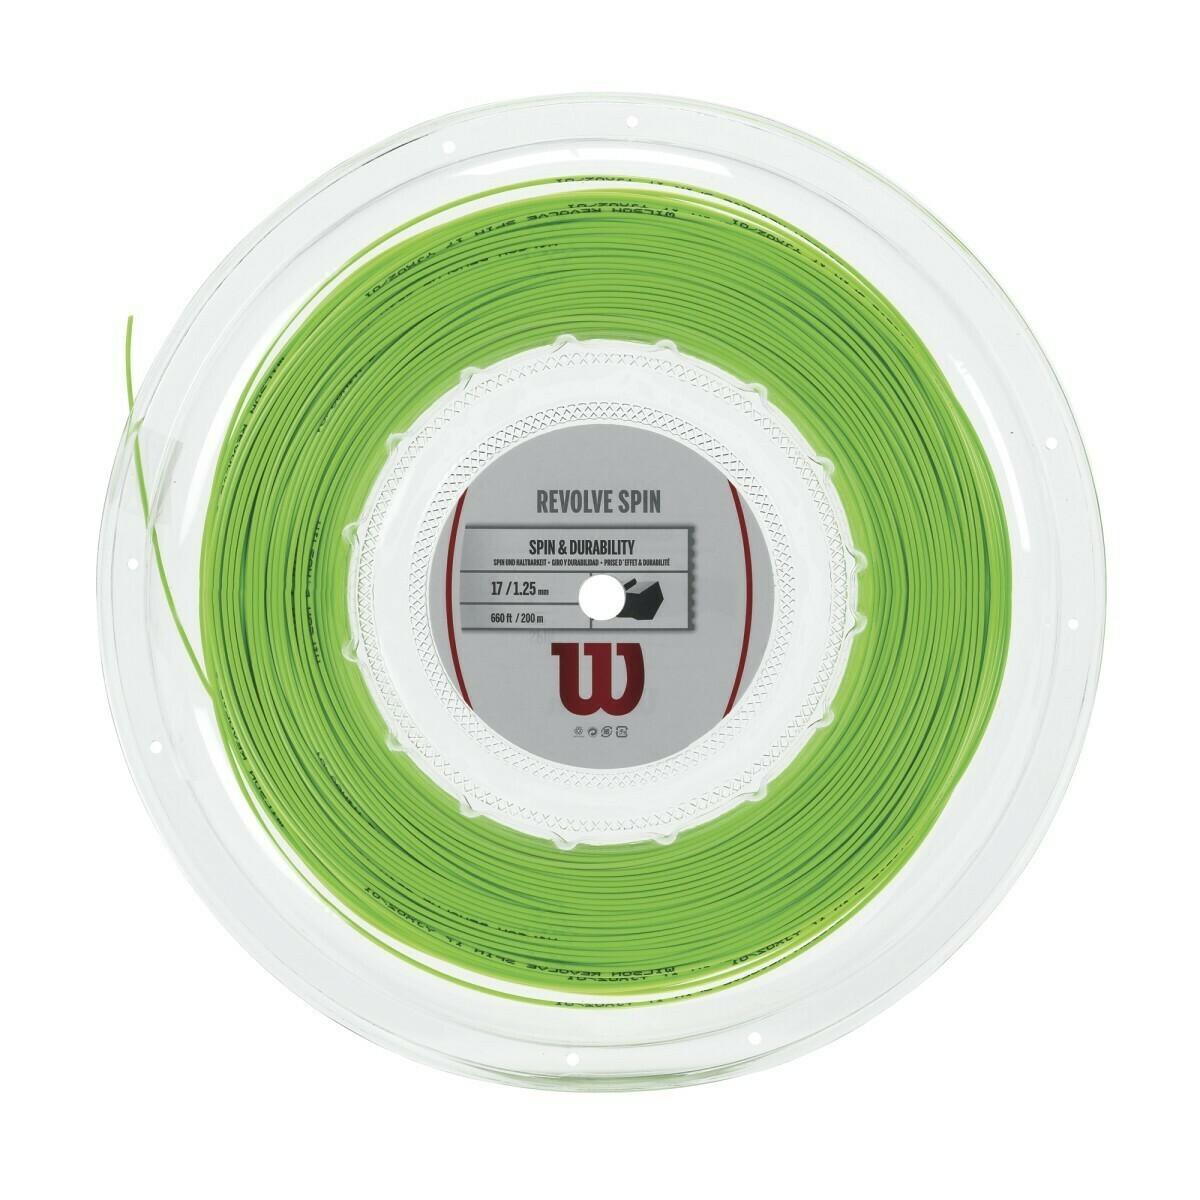 Wilson Revolve Spin 16 Tennis String 200m Reel - Green